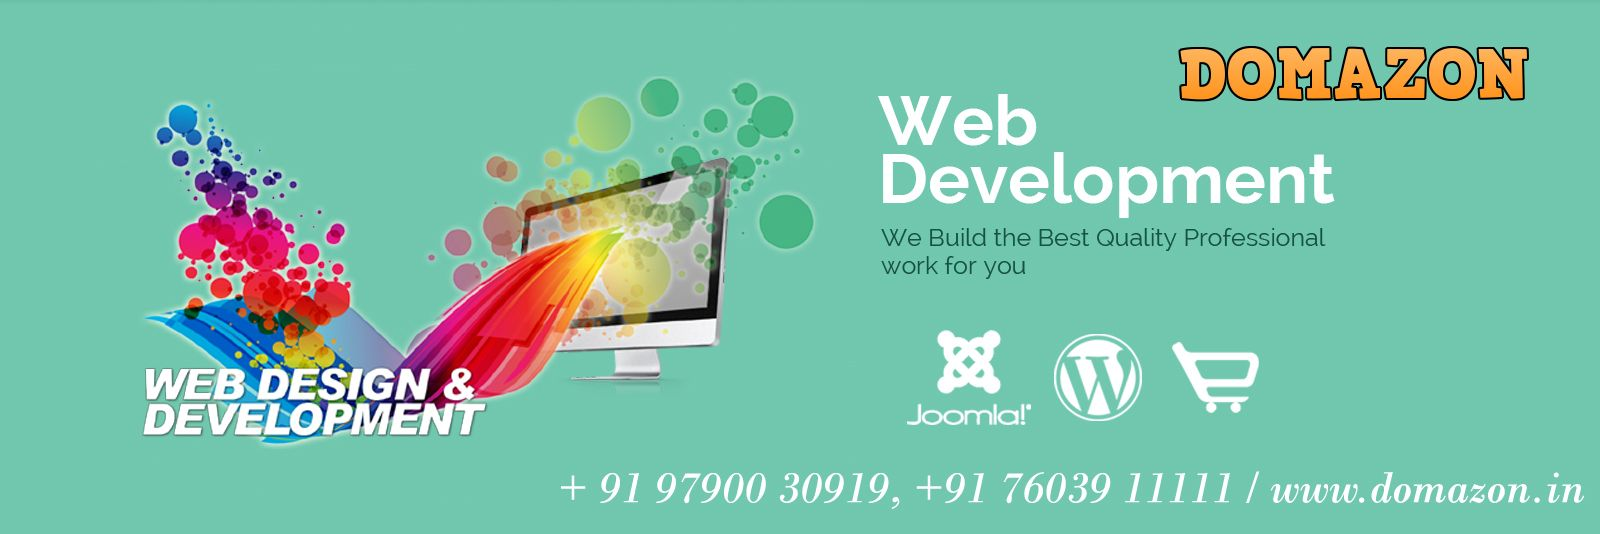 Domazon Get Your Stunning Website Today Web Design Web Design Company Professional Logo Design